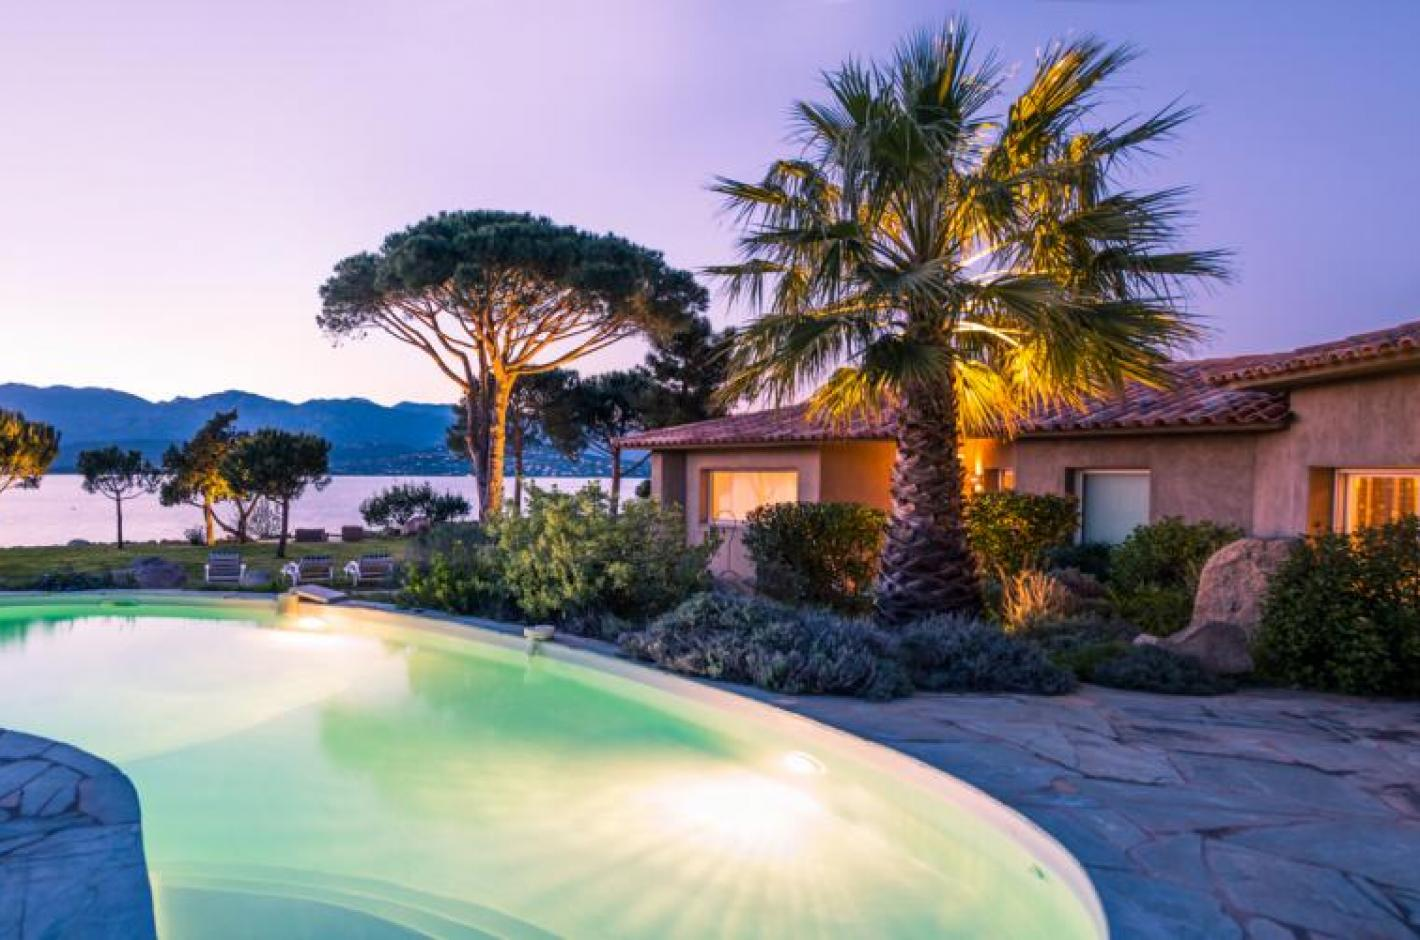 Villa pieds dans l 39 eau proche avec piscine priv e porto for Villa avec piscine en corse